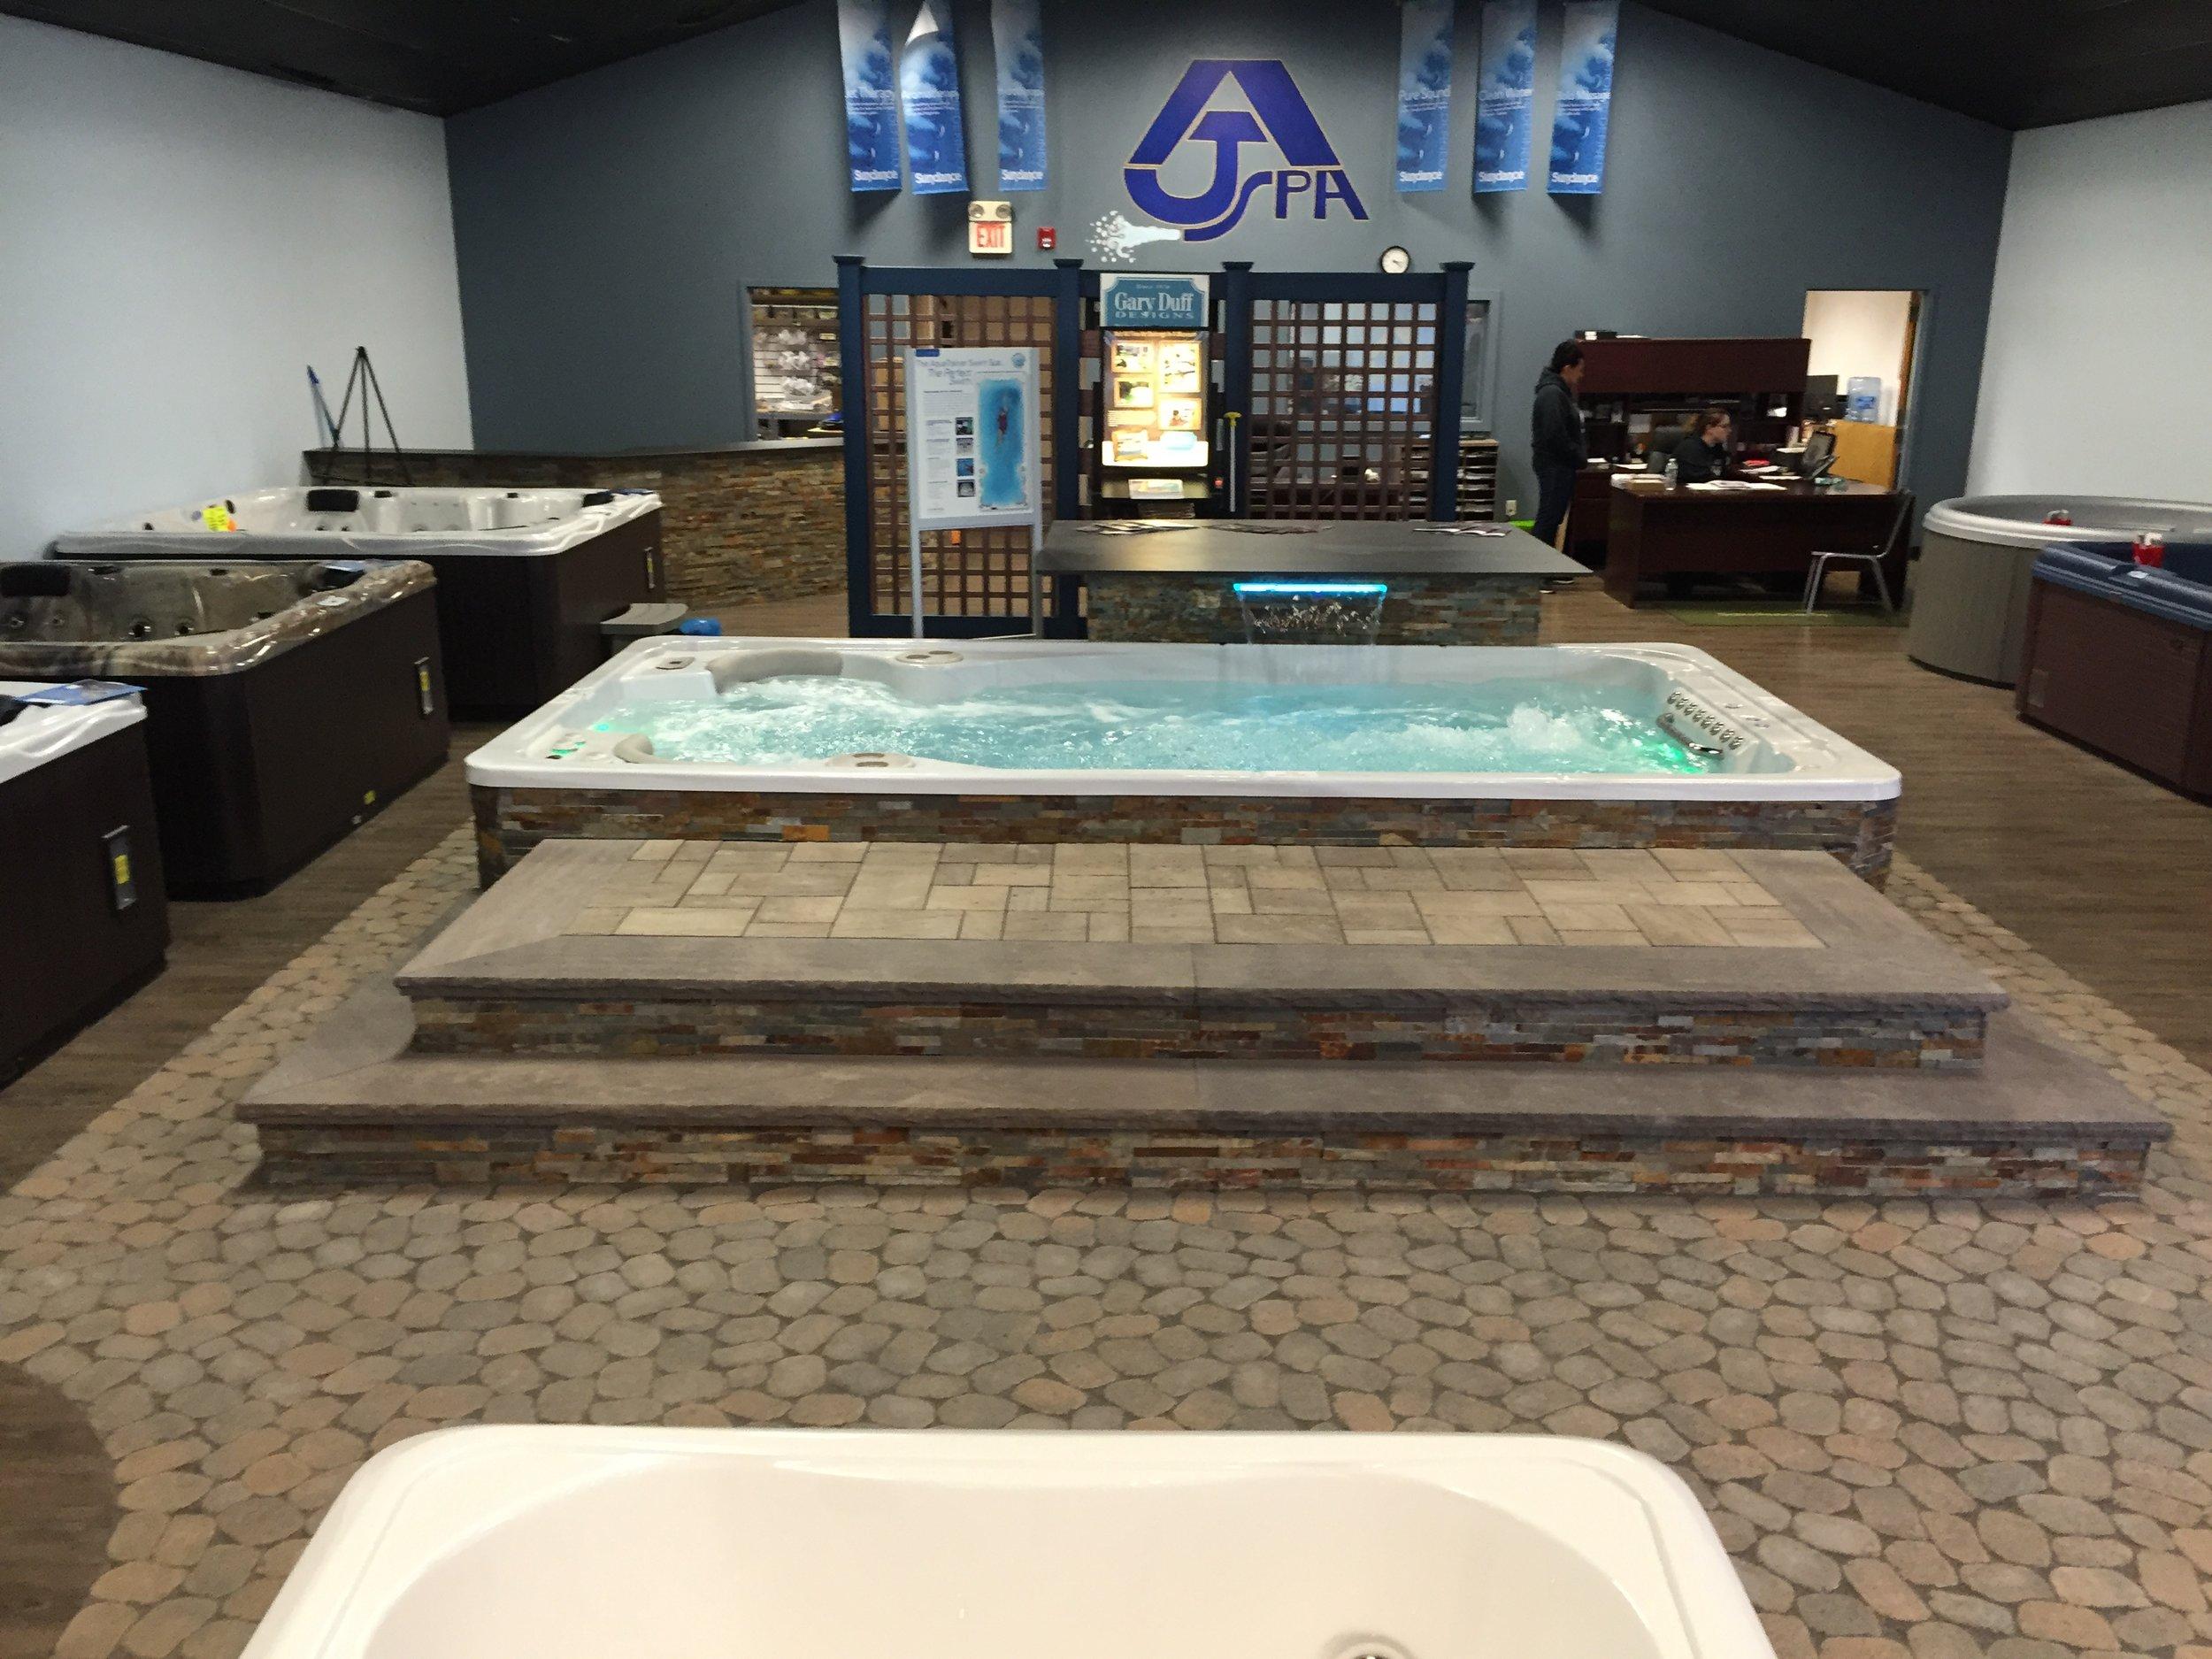 Top indoor hot tub design company in Long Island, NY